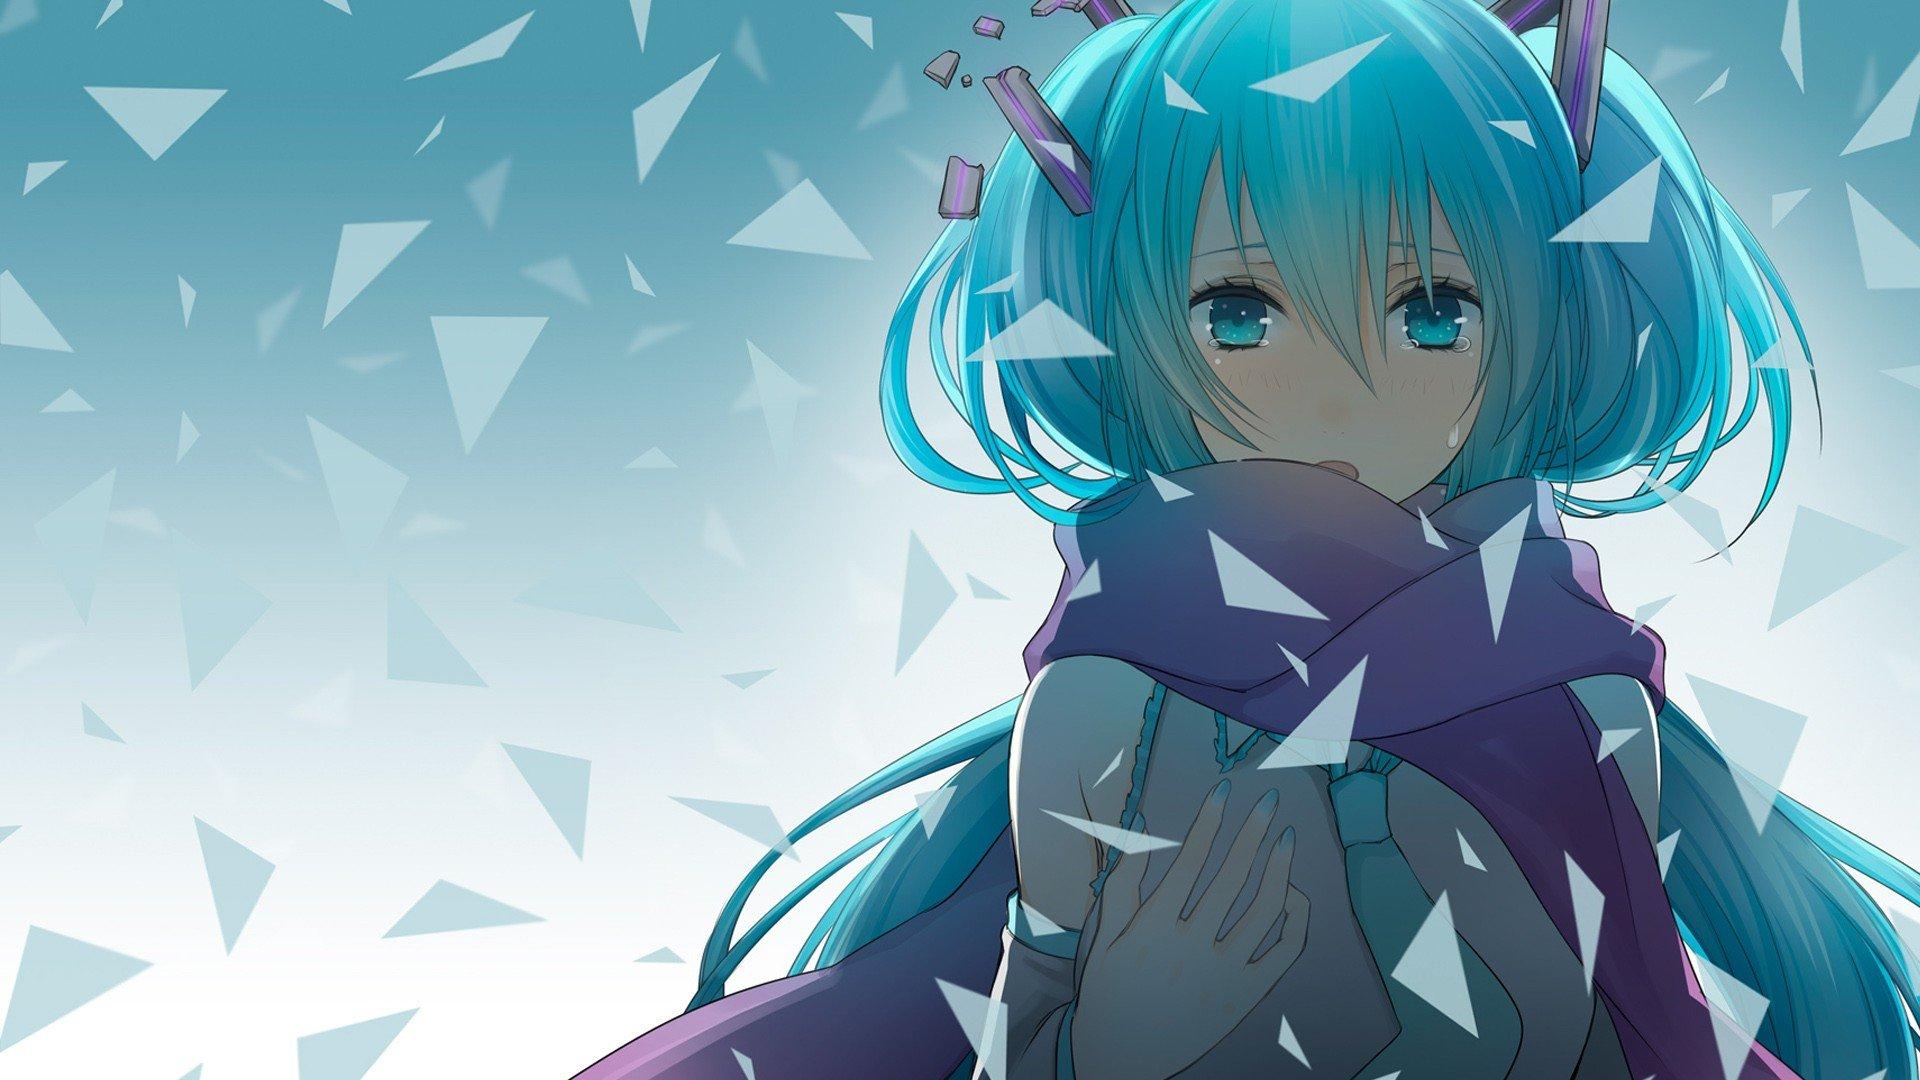 Vocaloid Hatsune Miku Scarfs Aqua Eyes Aqua Hair Anime Girls Wallpaper 1920x1080 299273 Wallpaperup